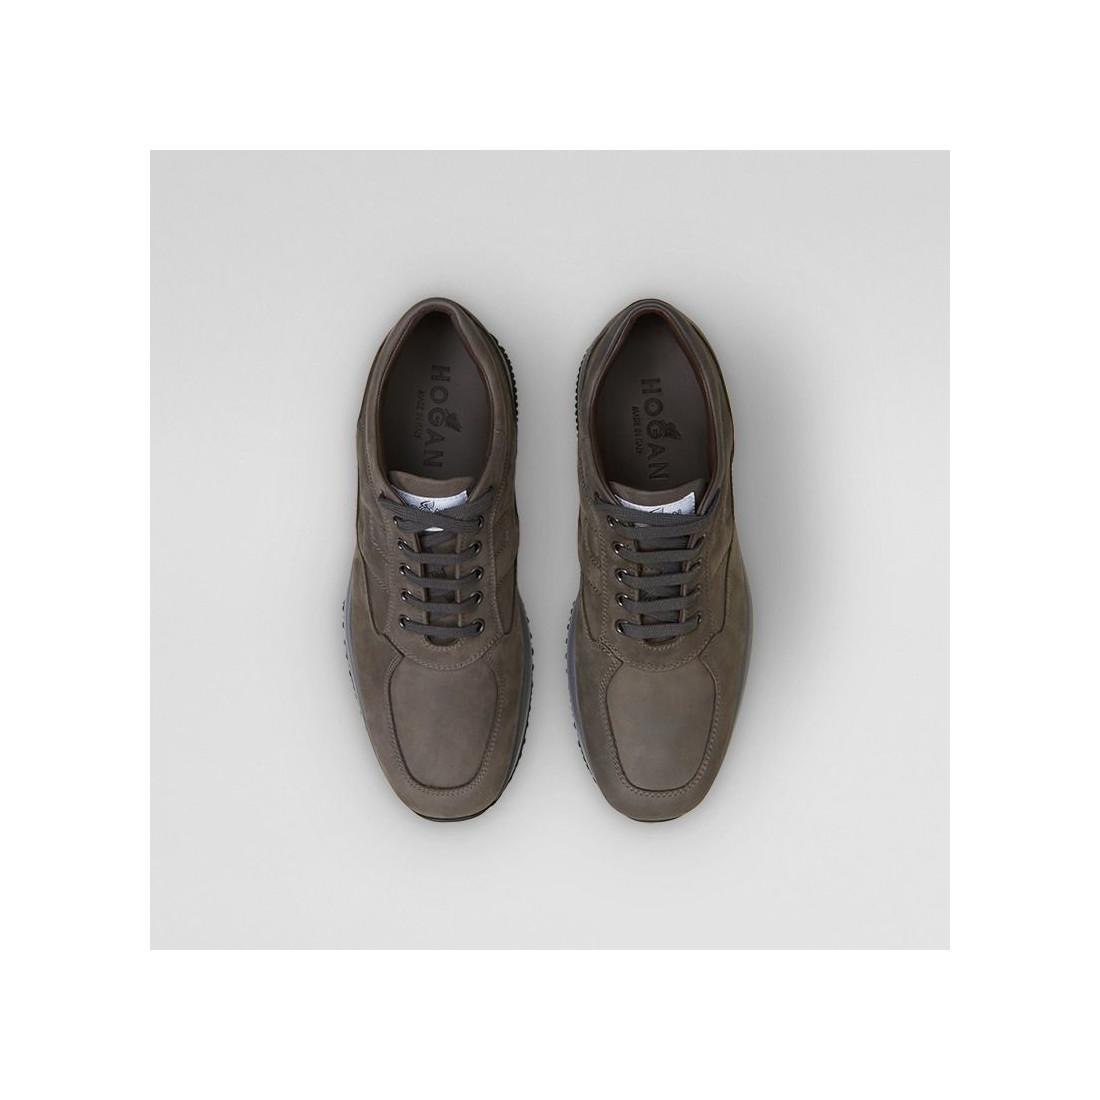 sneakers man hogan hxm00n00010dscb611 3435